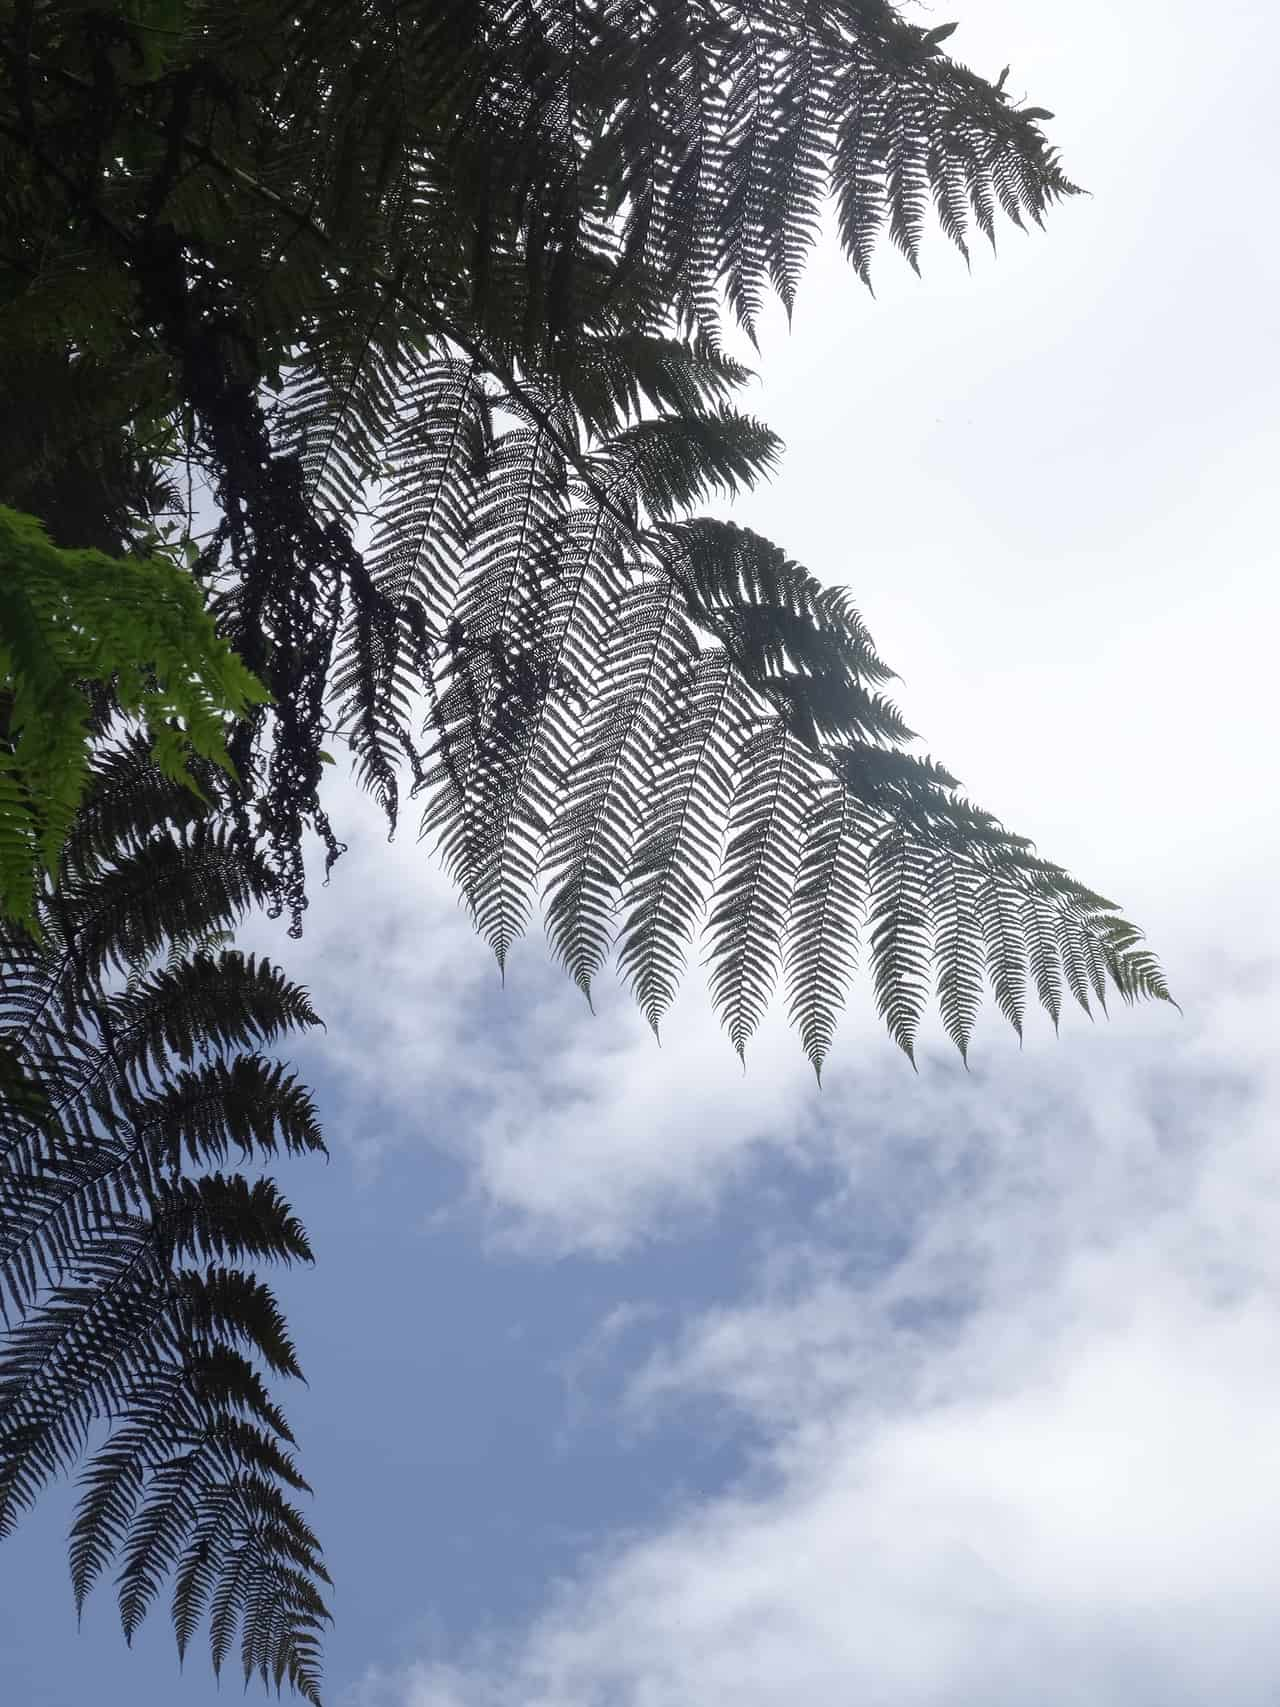 Natur (Bild: Martina Schäfer, Textrakt Textagentur)